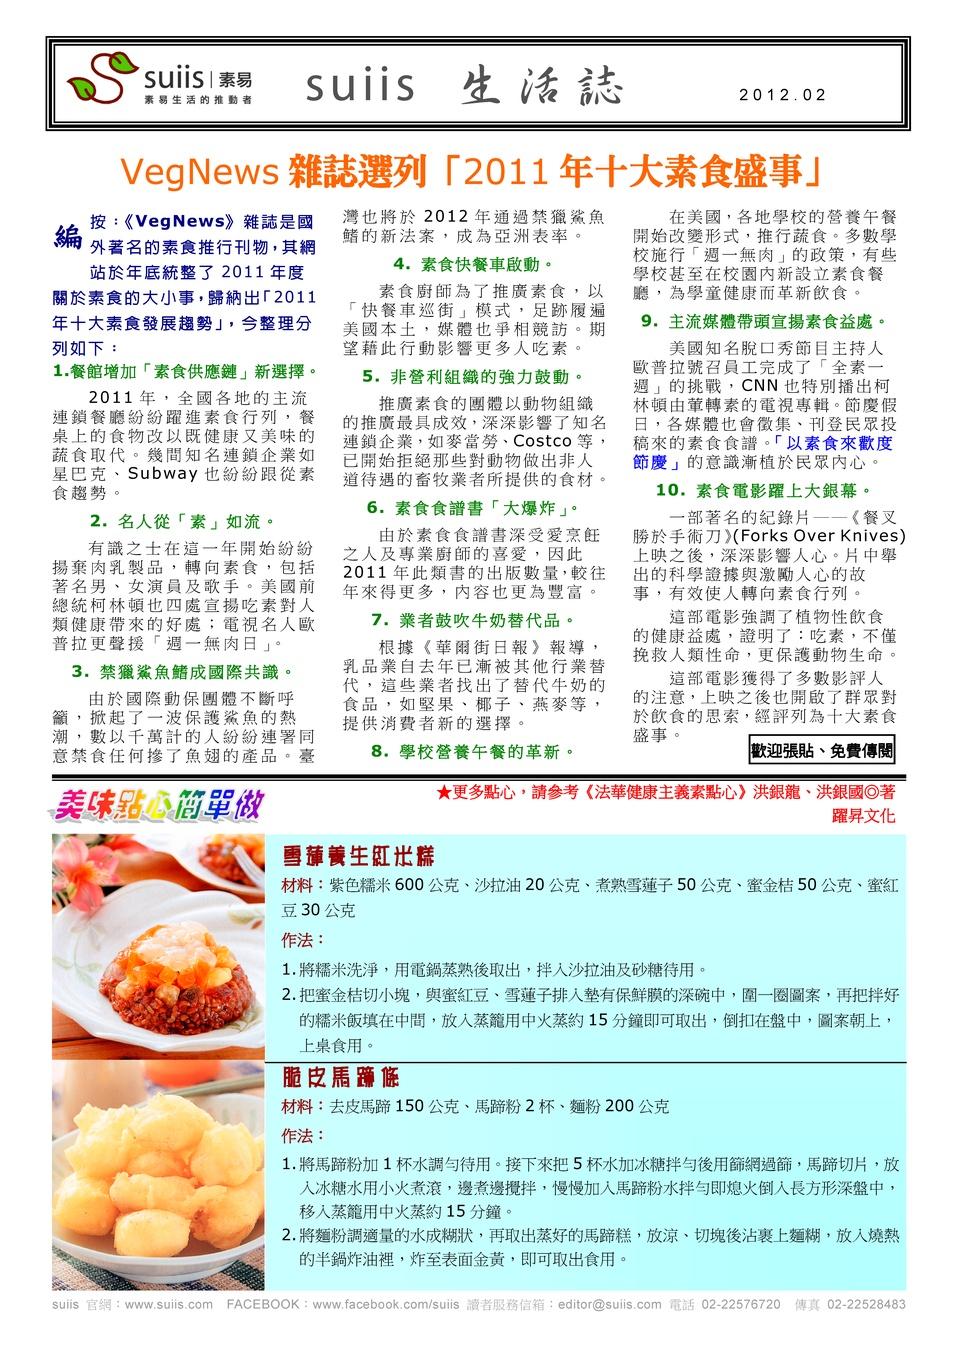 suiis 生活誌-2012-02_Page_1